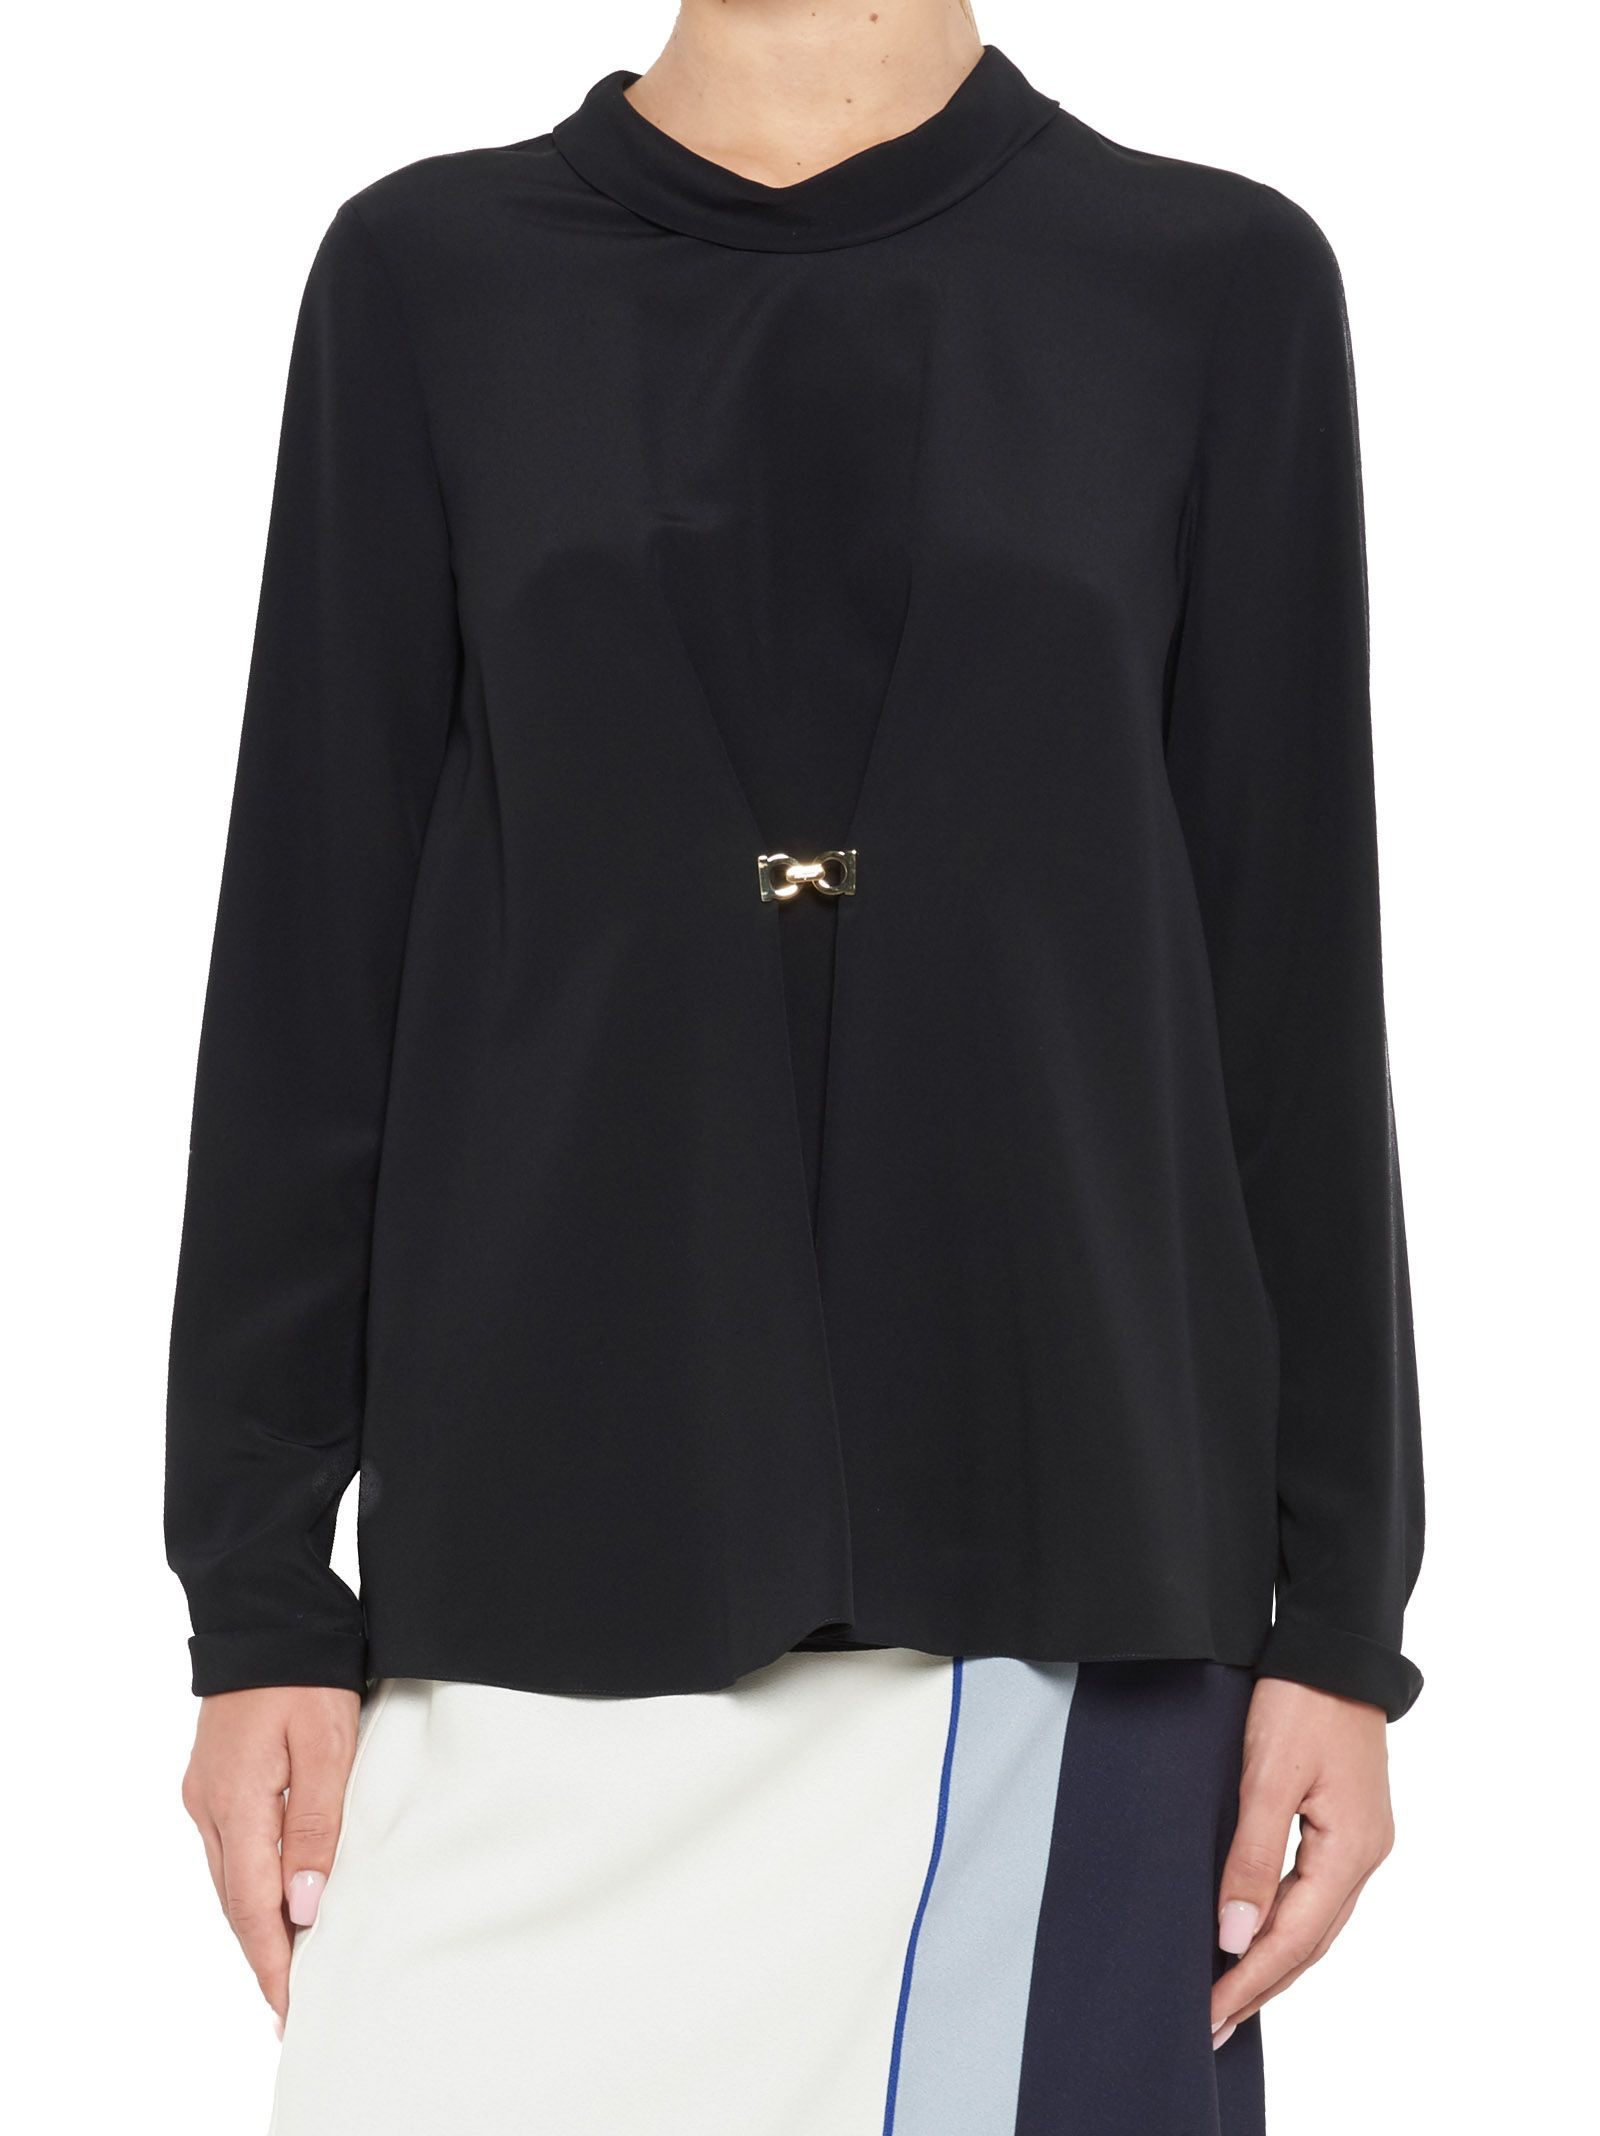 Salvatore Ferragamo Silk Shirt